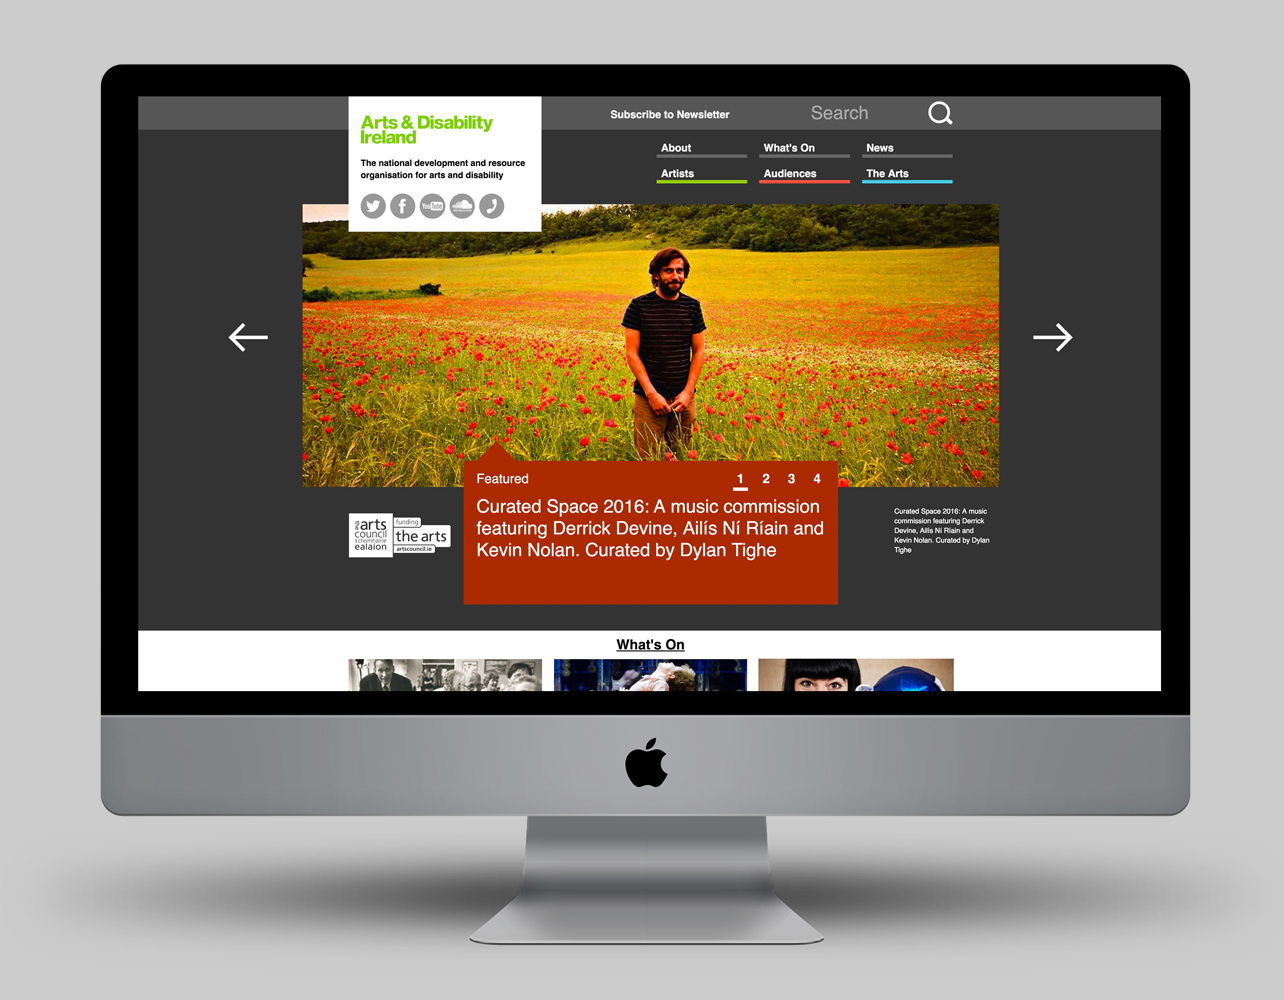 Cover image: Arts & Disability Ireland website